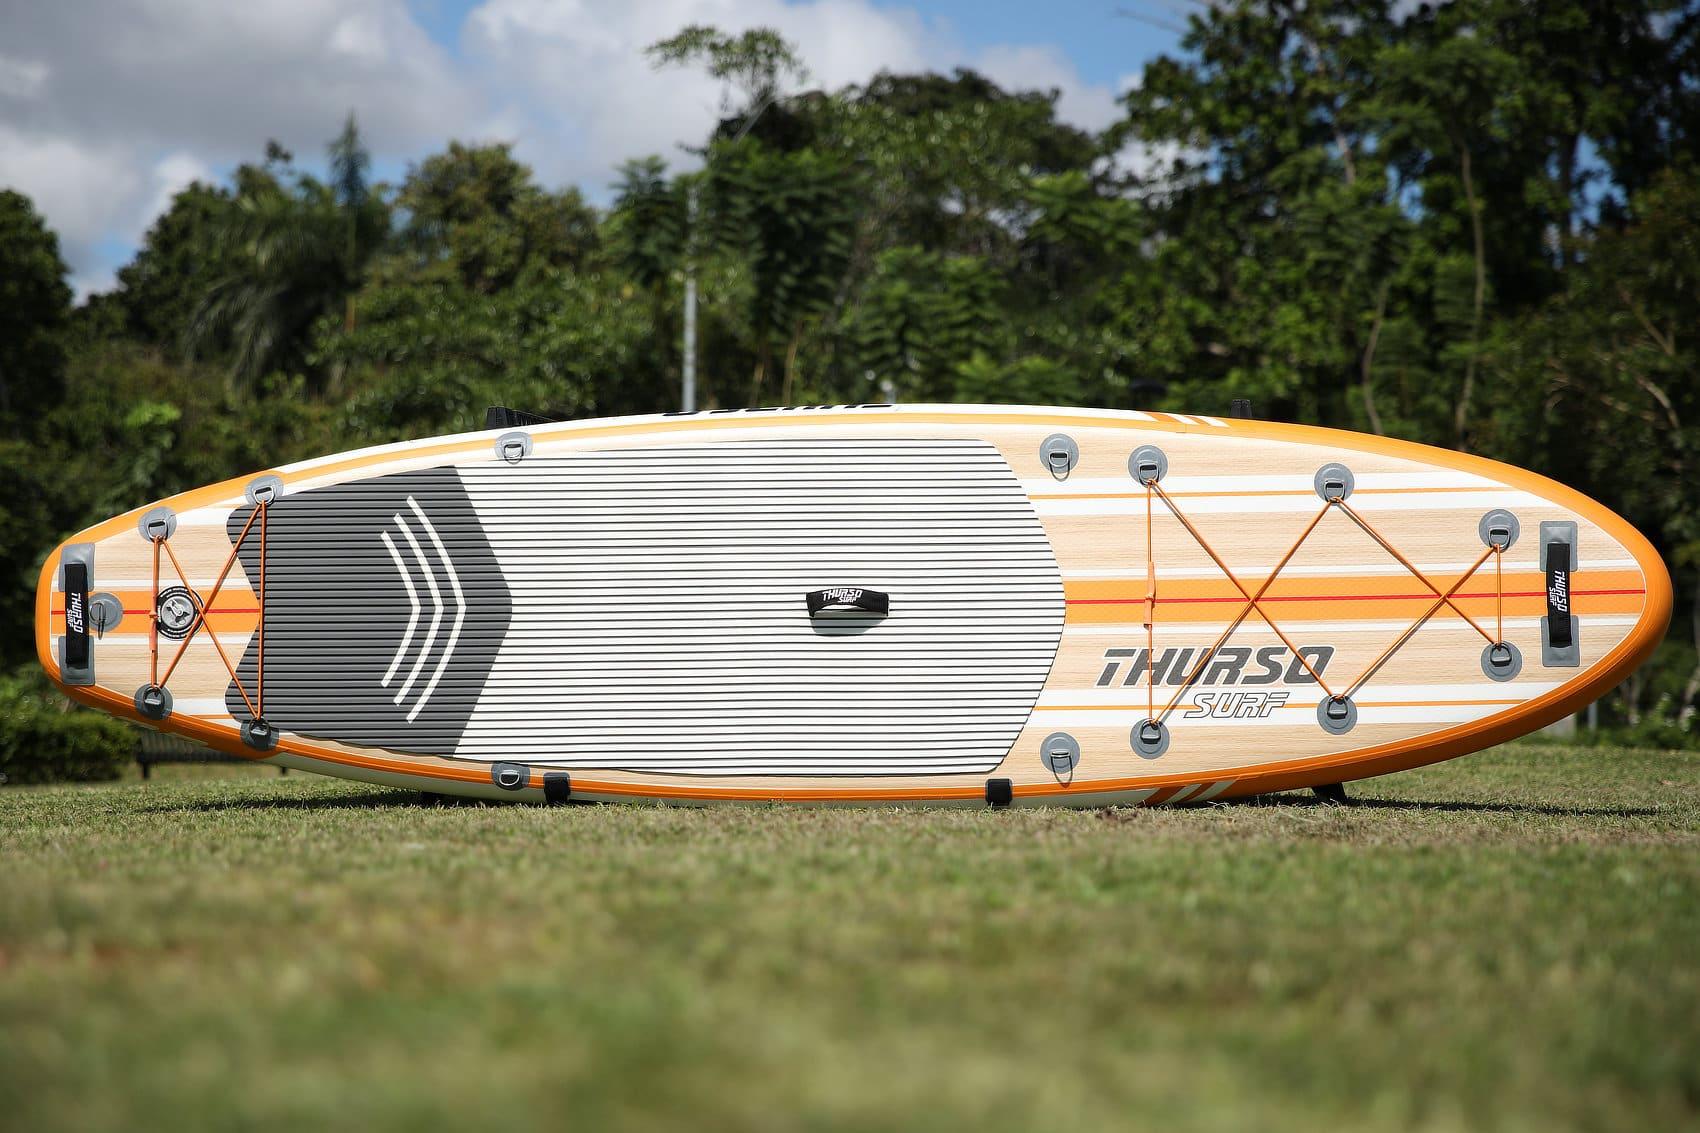 THURSO SURF Waterwalker 10' Top